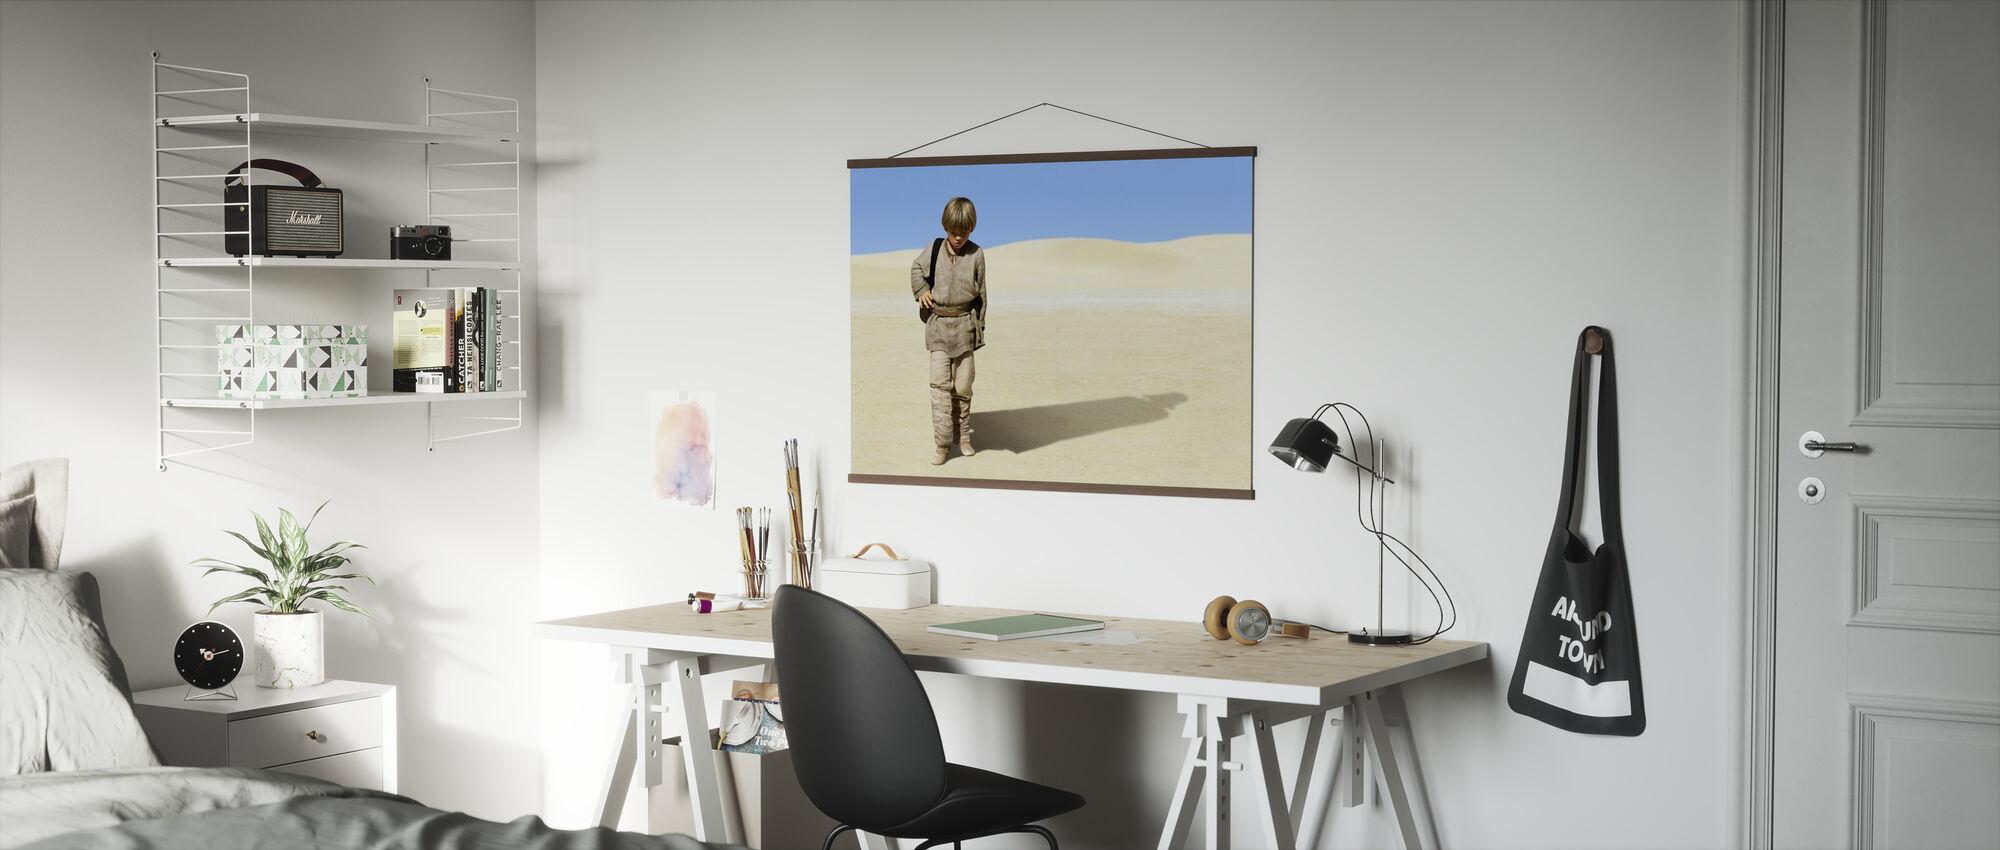 Stjärnornas krig - Unga Anakin Skywalker 1 - Poster - Kontor